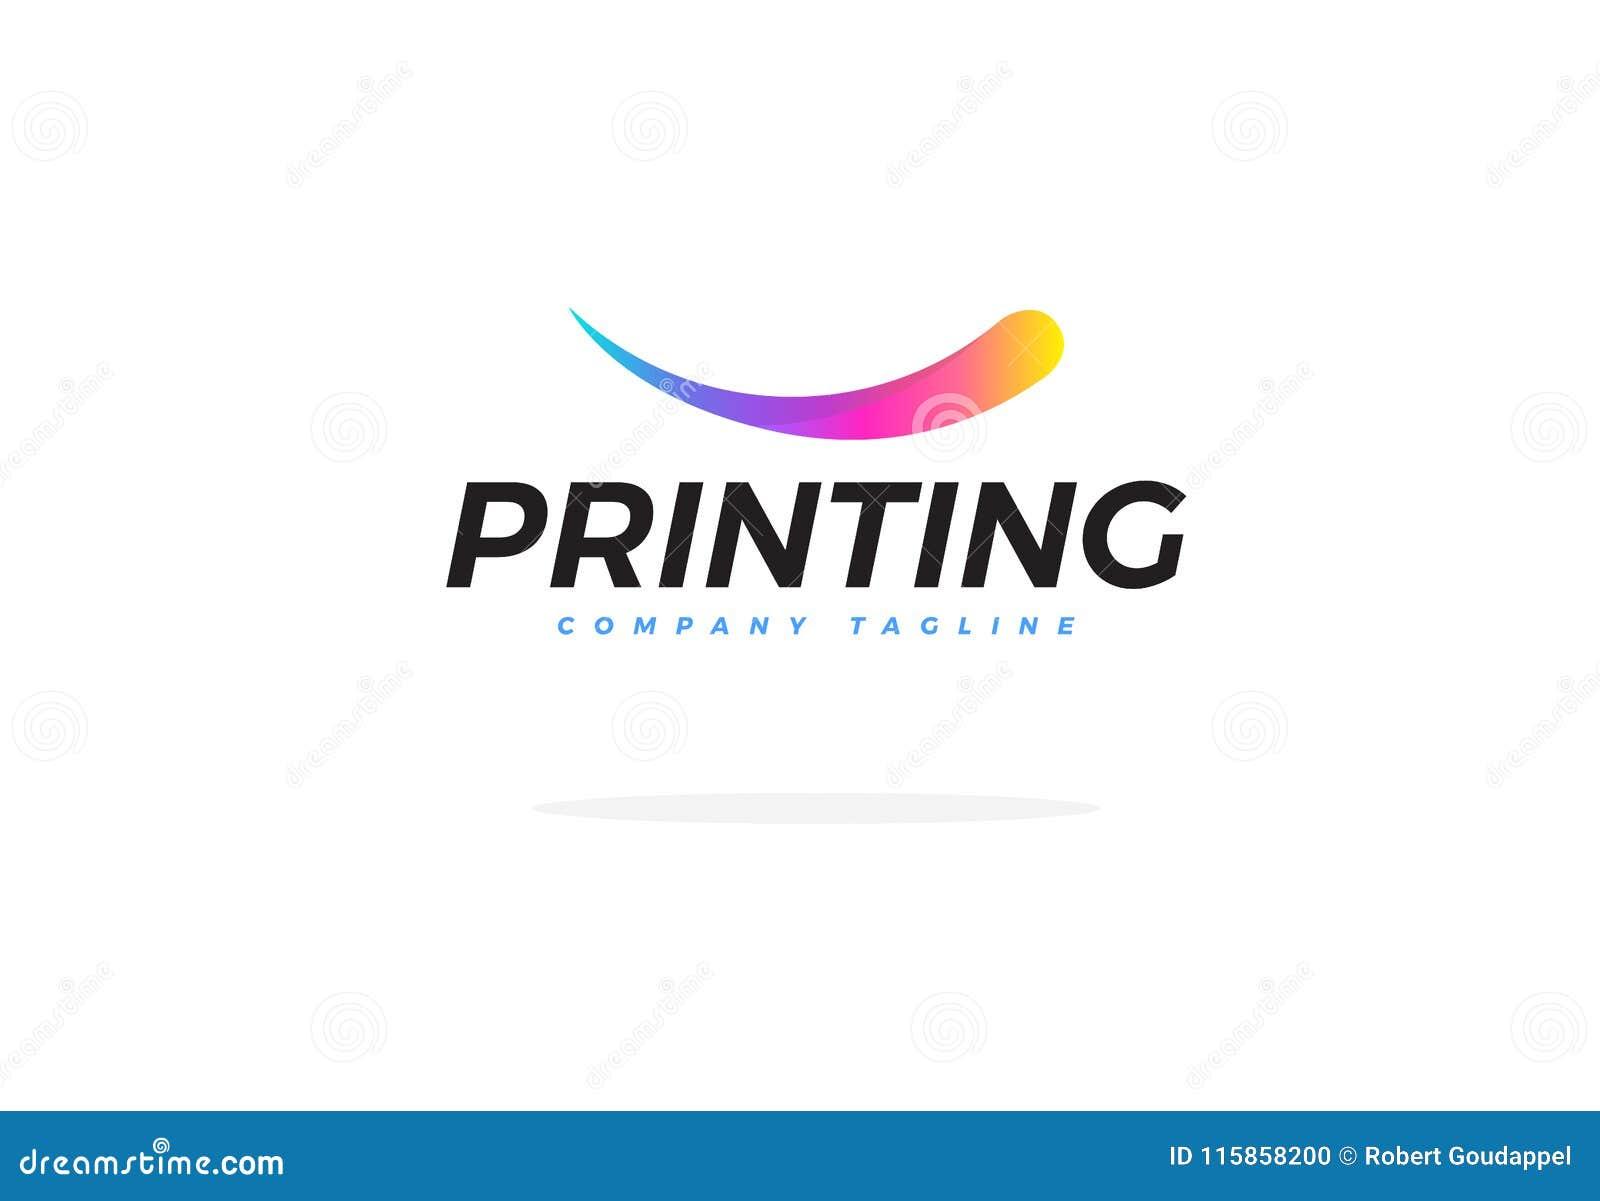 Logo For Printing Company Vetora colorido